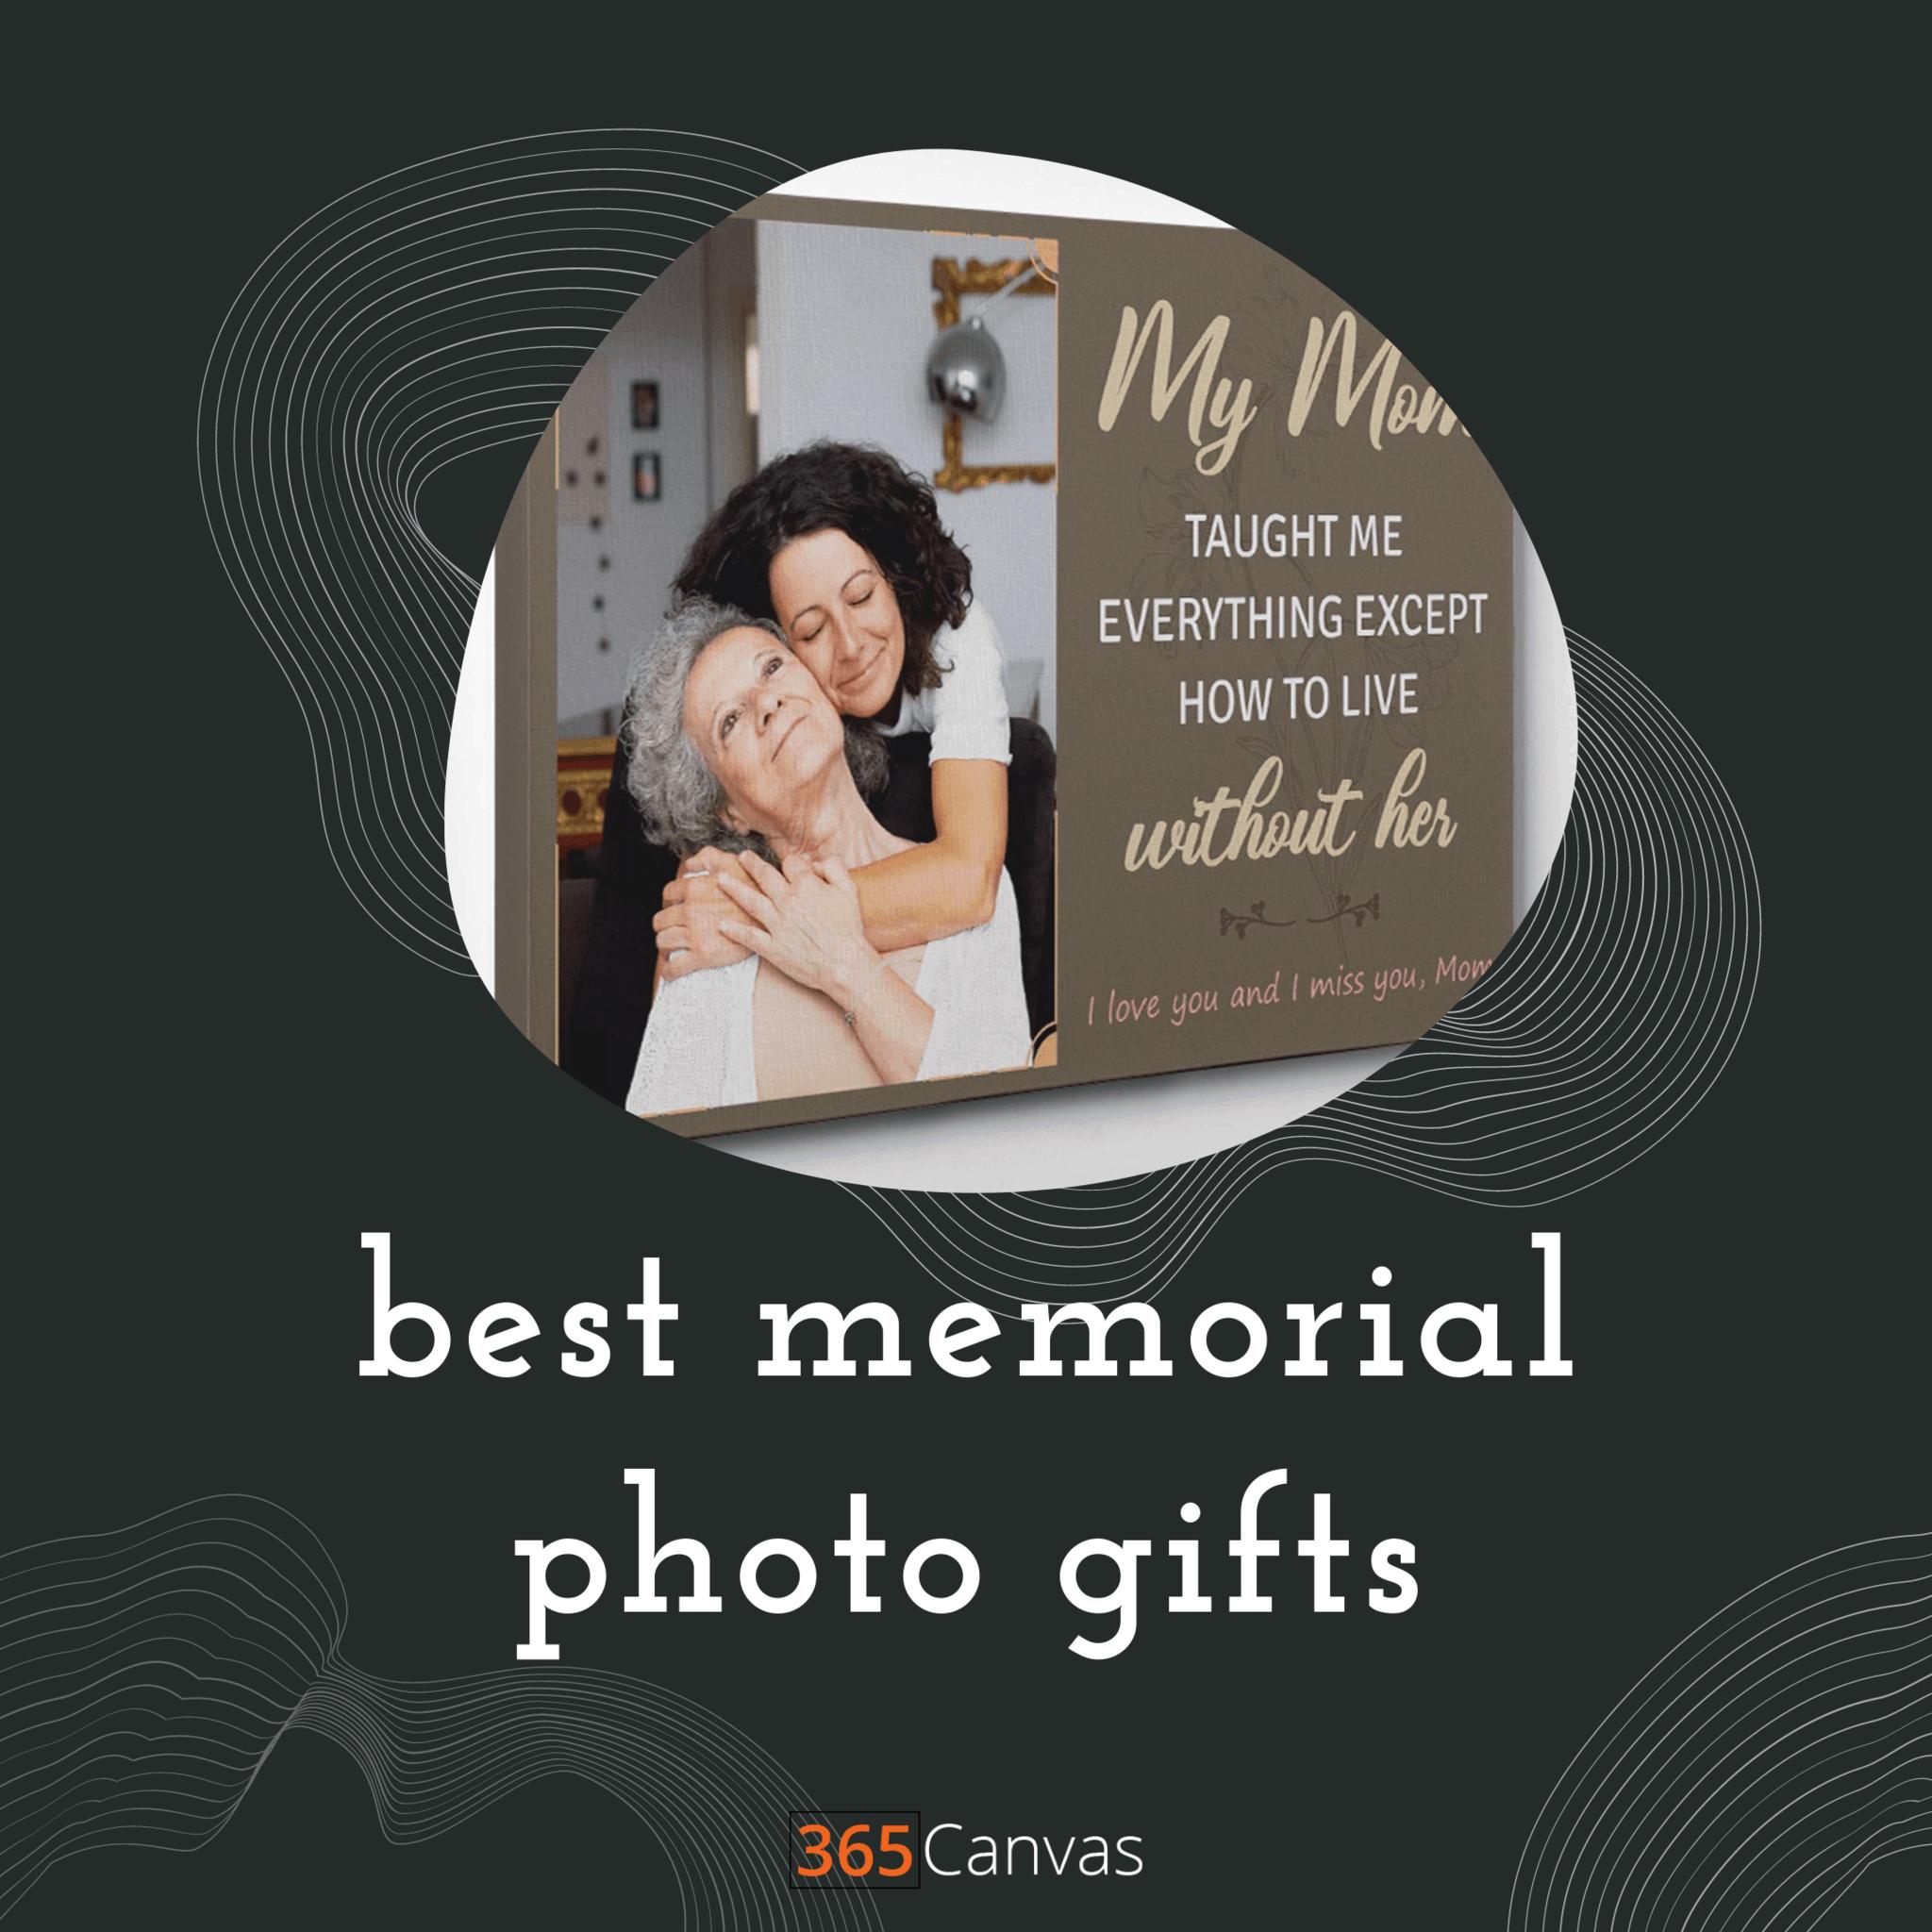 Best Memorial Photo Gifts